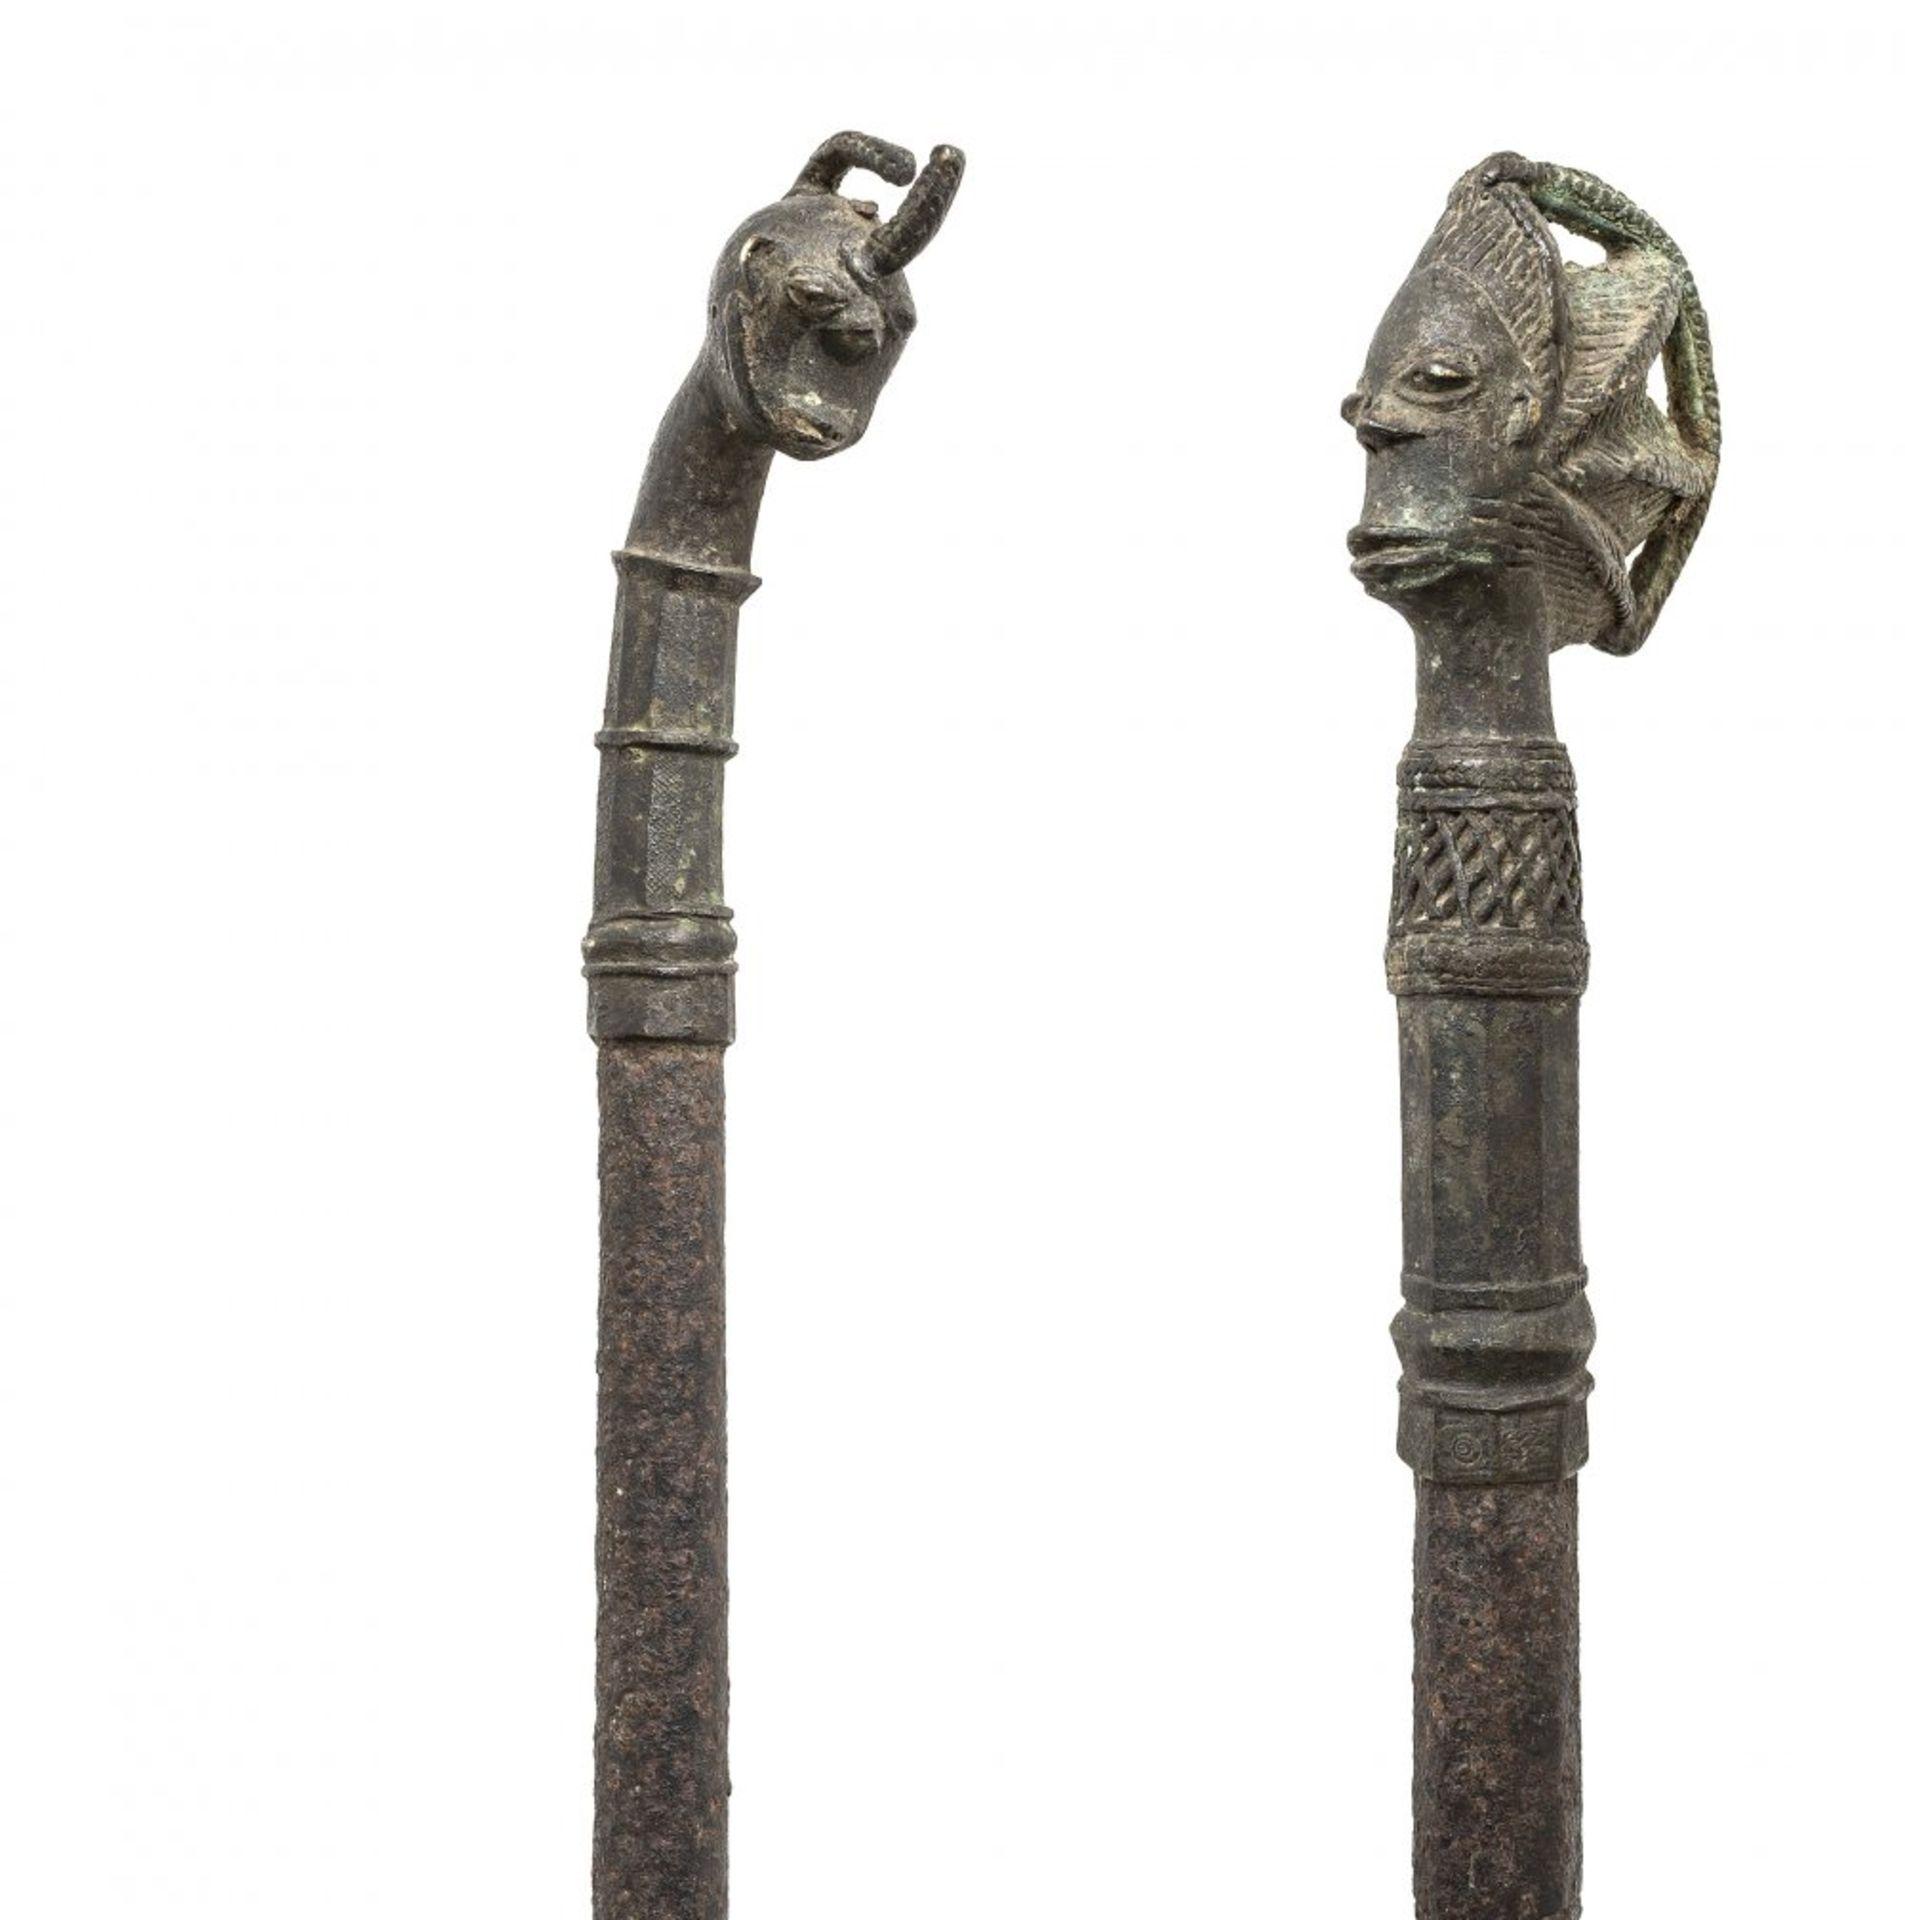 Los 198 - RitualstabAfrika, wohl Yoruba (Nigeria). Ogboni-Geheimbund. Bronze. L. 57,5 cm....